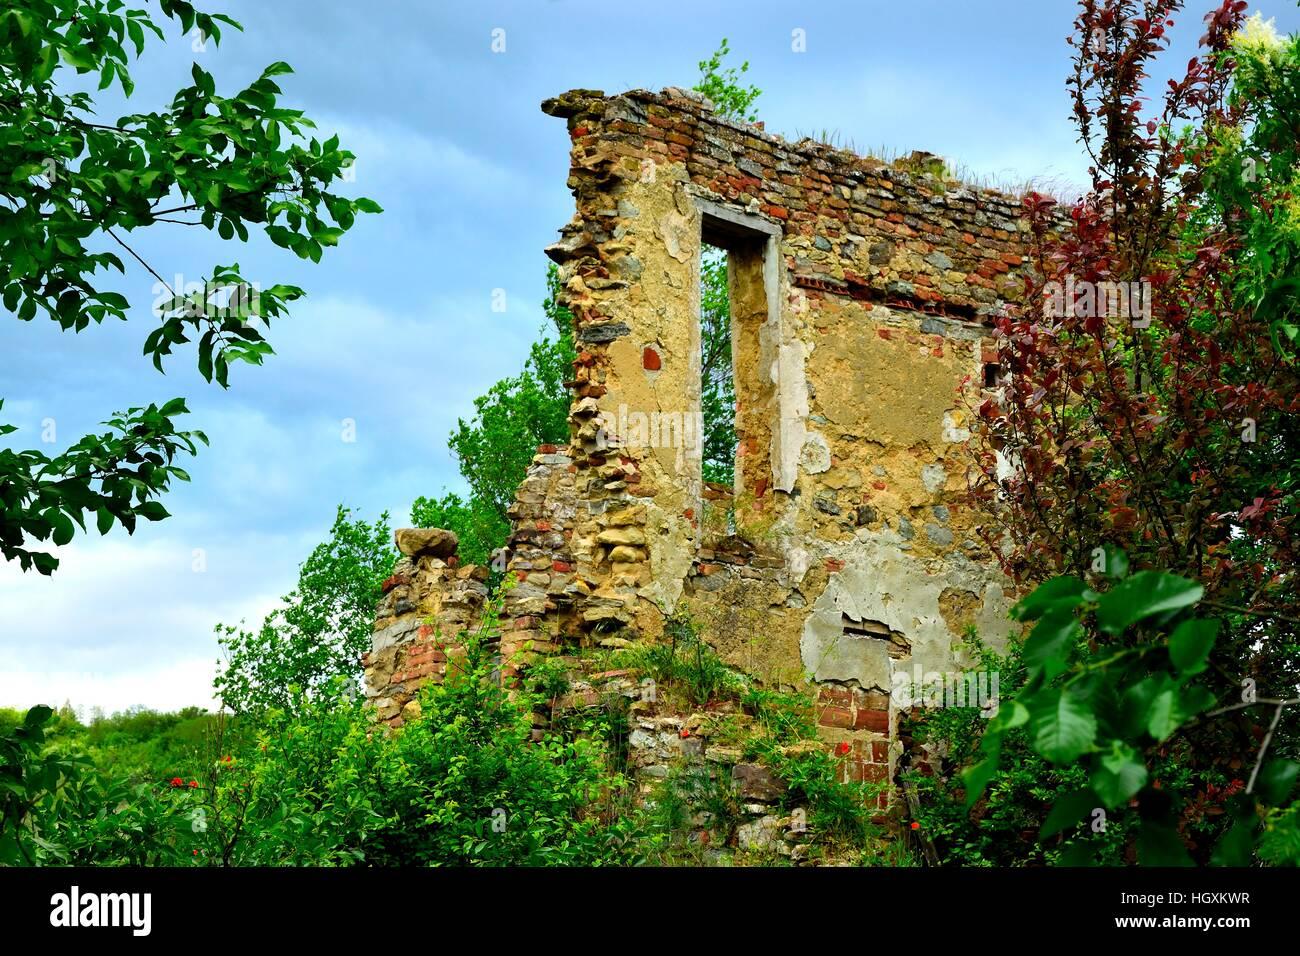 Broken Wall amid trees - Stock Image